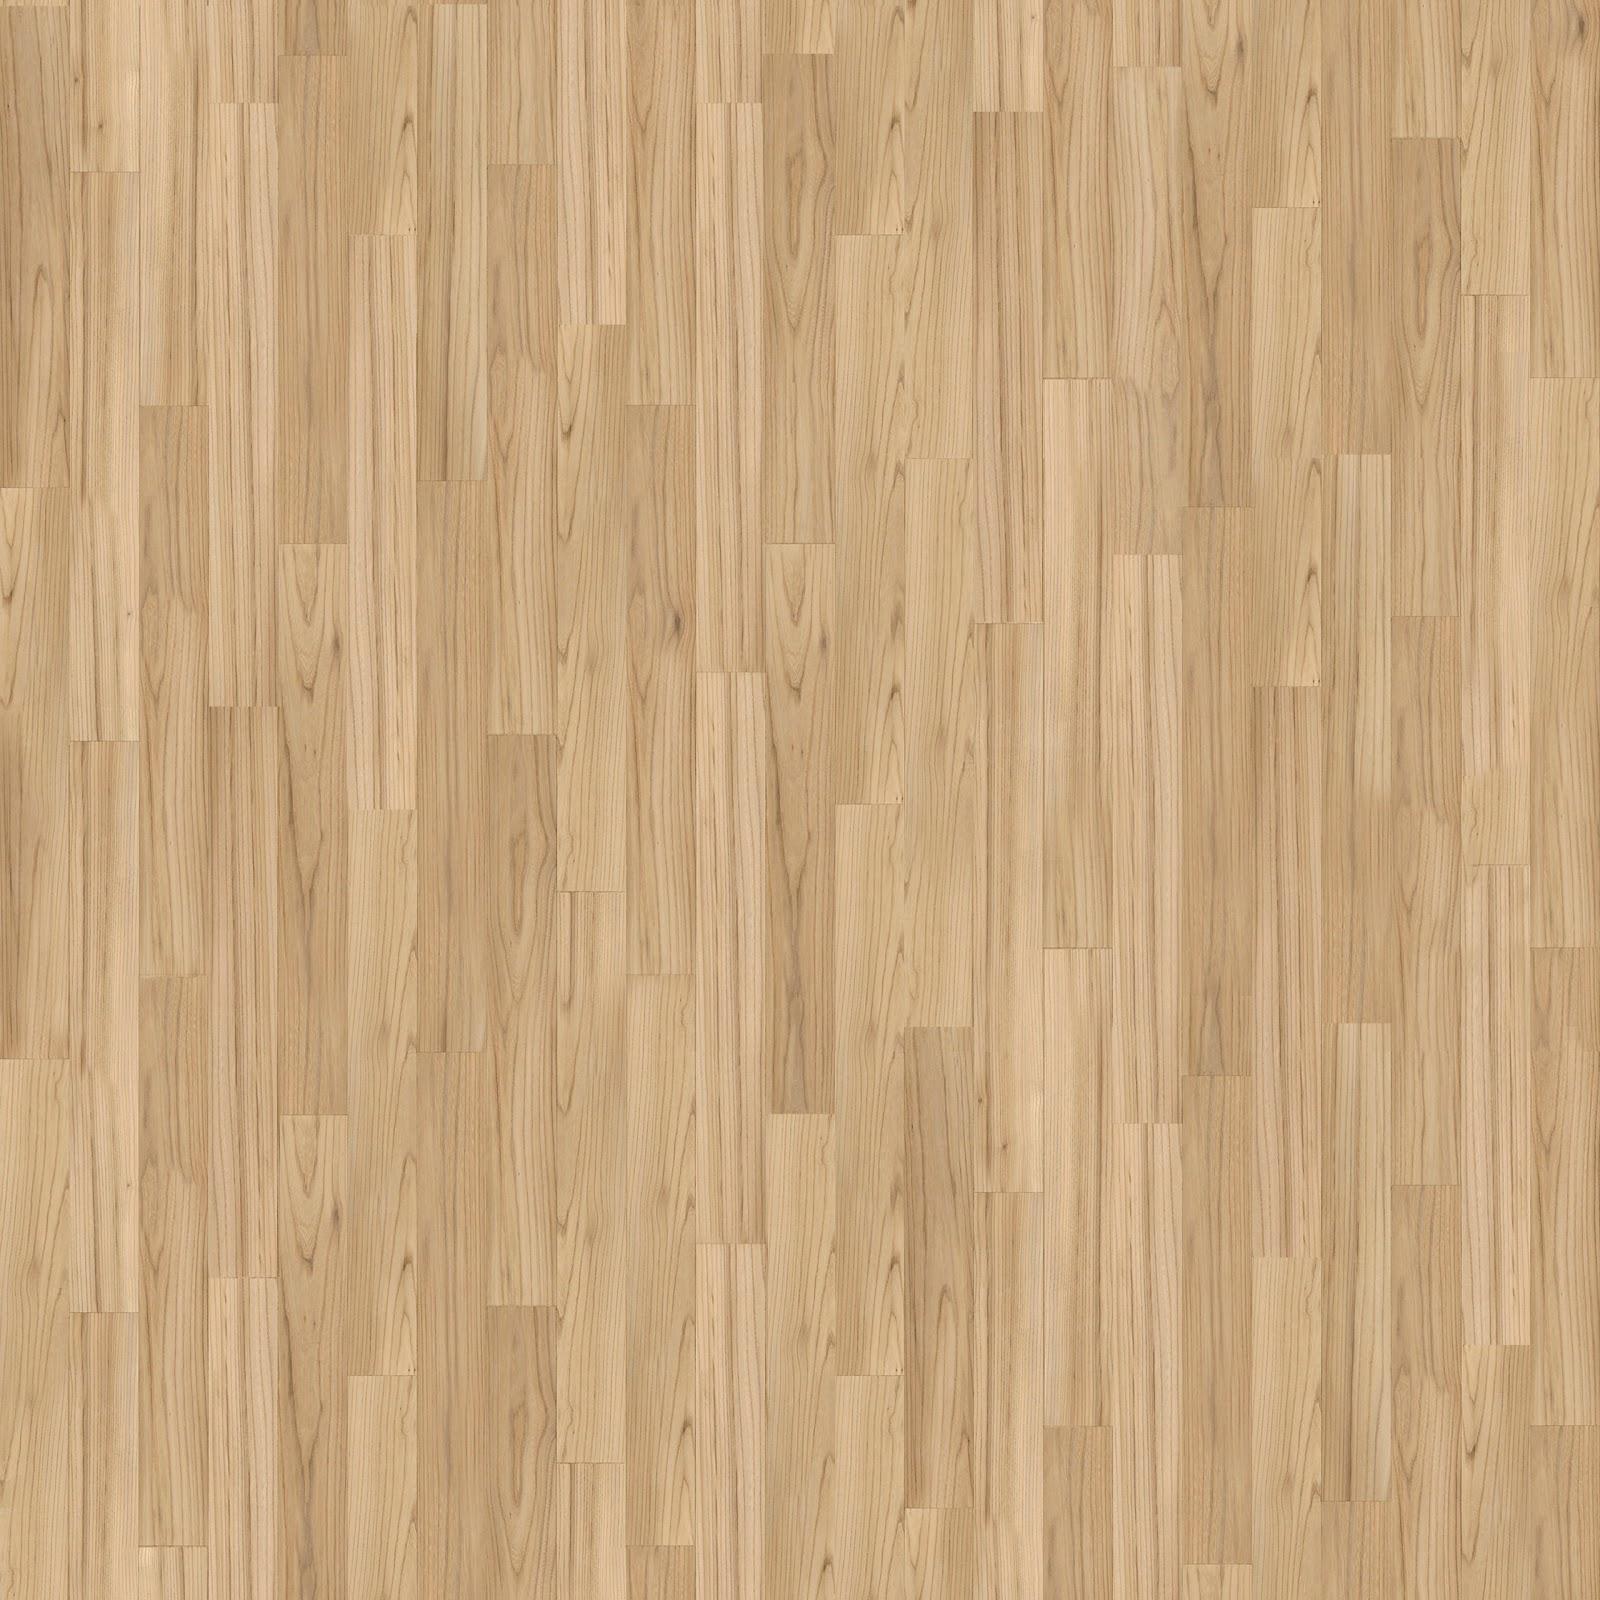 simo texture seamless parquet rovere. Black Bedroom Furniture Sets. Home Design Ideas